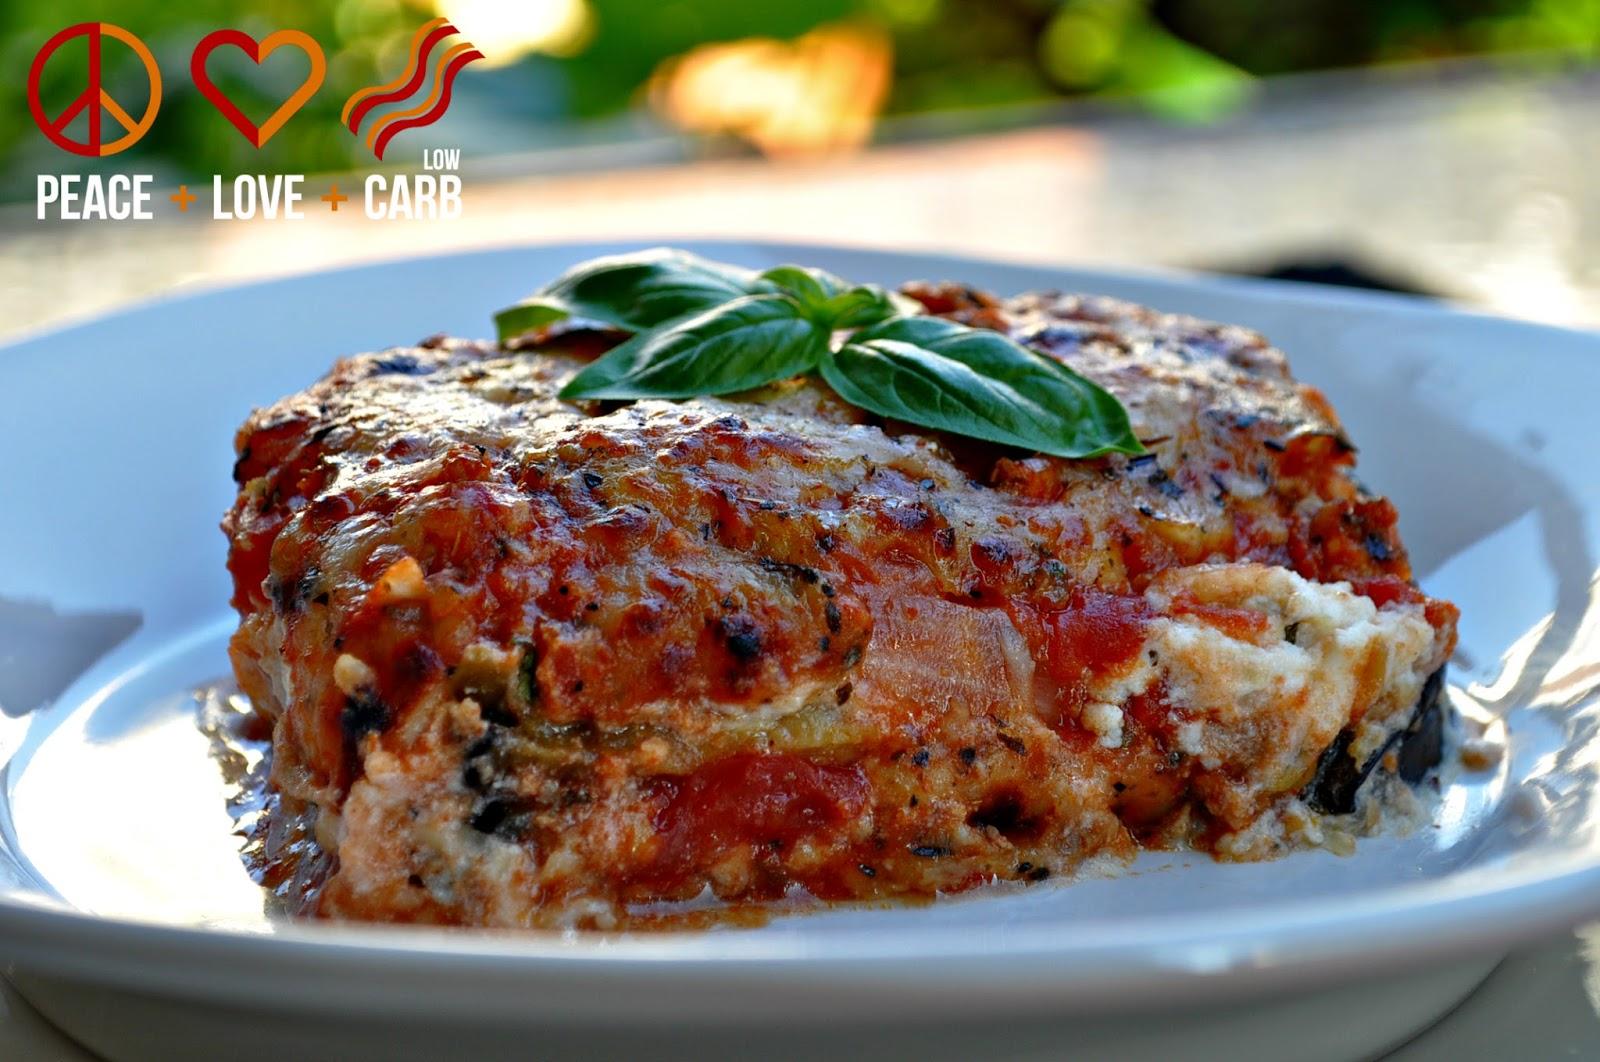 Eggplant Lasagna With Meat Sauce Low Carb Lasagna Watermelon Wallpaper Rainbow Find Free HD for Desktop [freshlhys.tk]